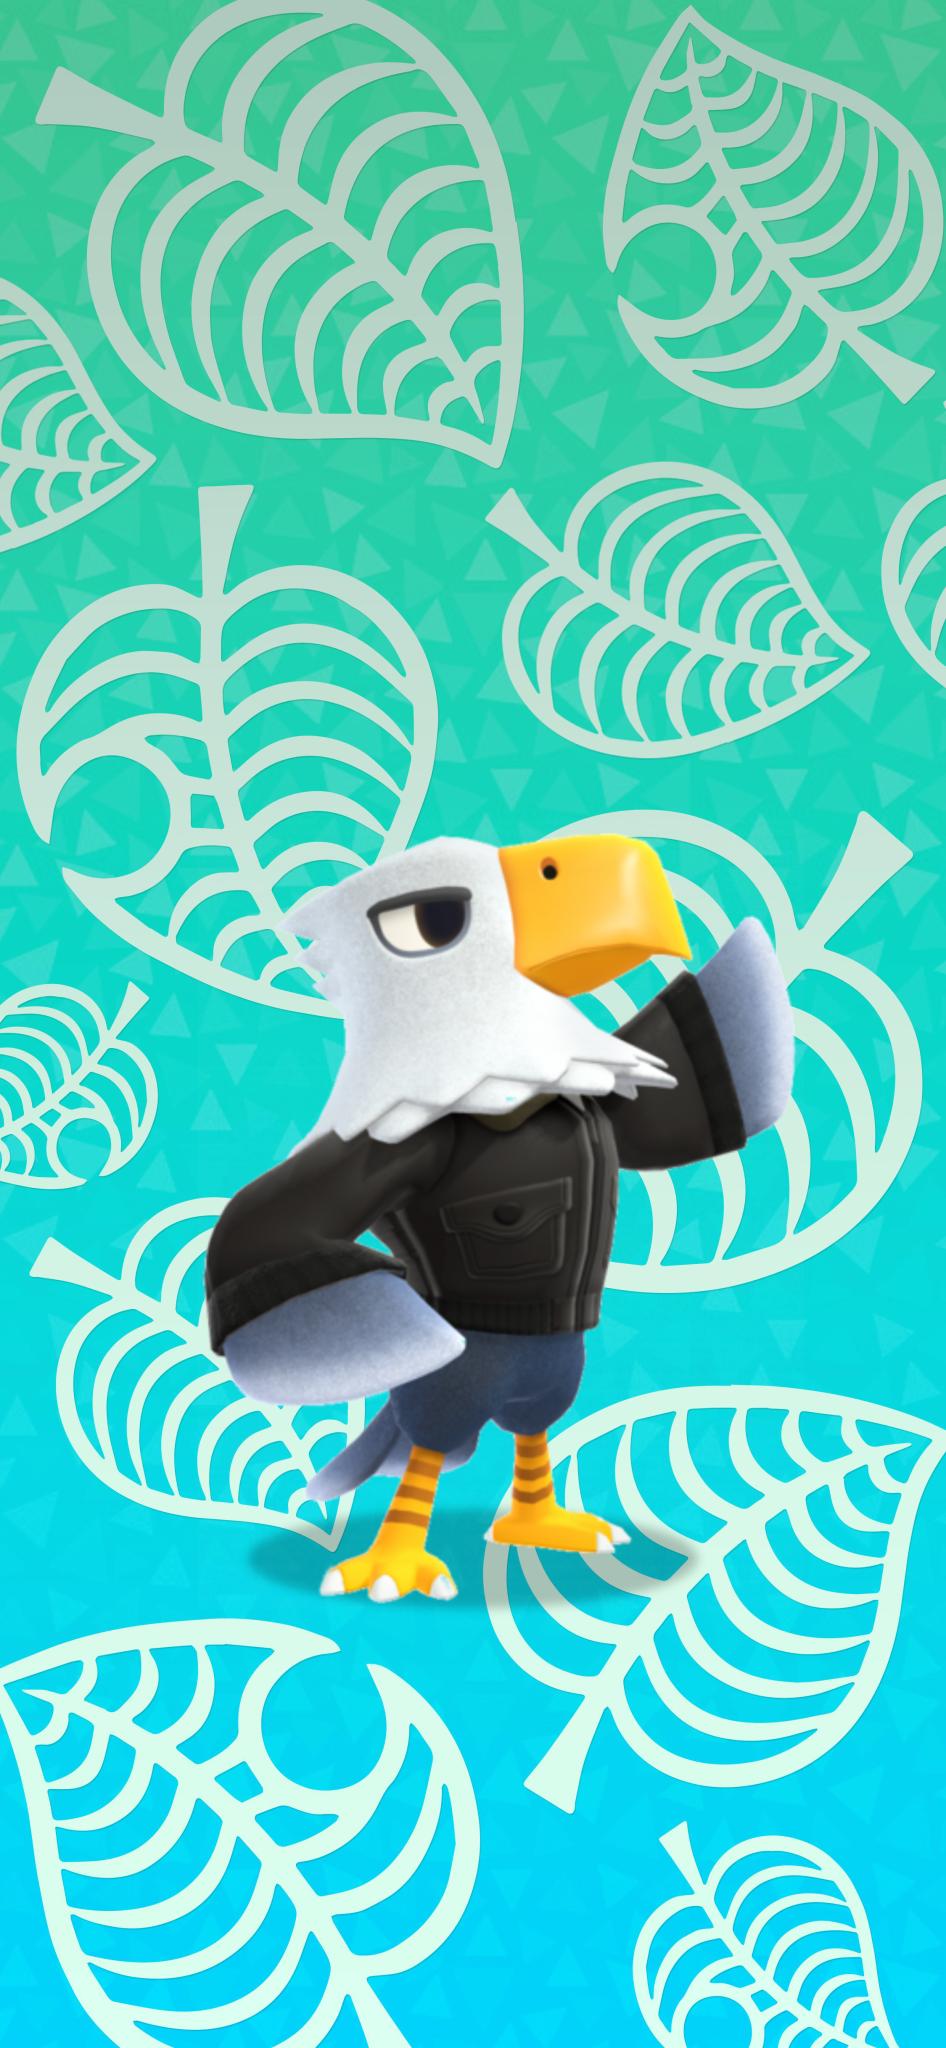 Pin On Crossing Animal Animal Crossing Animal Crossing Villagers Animal Crossing Characters